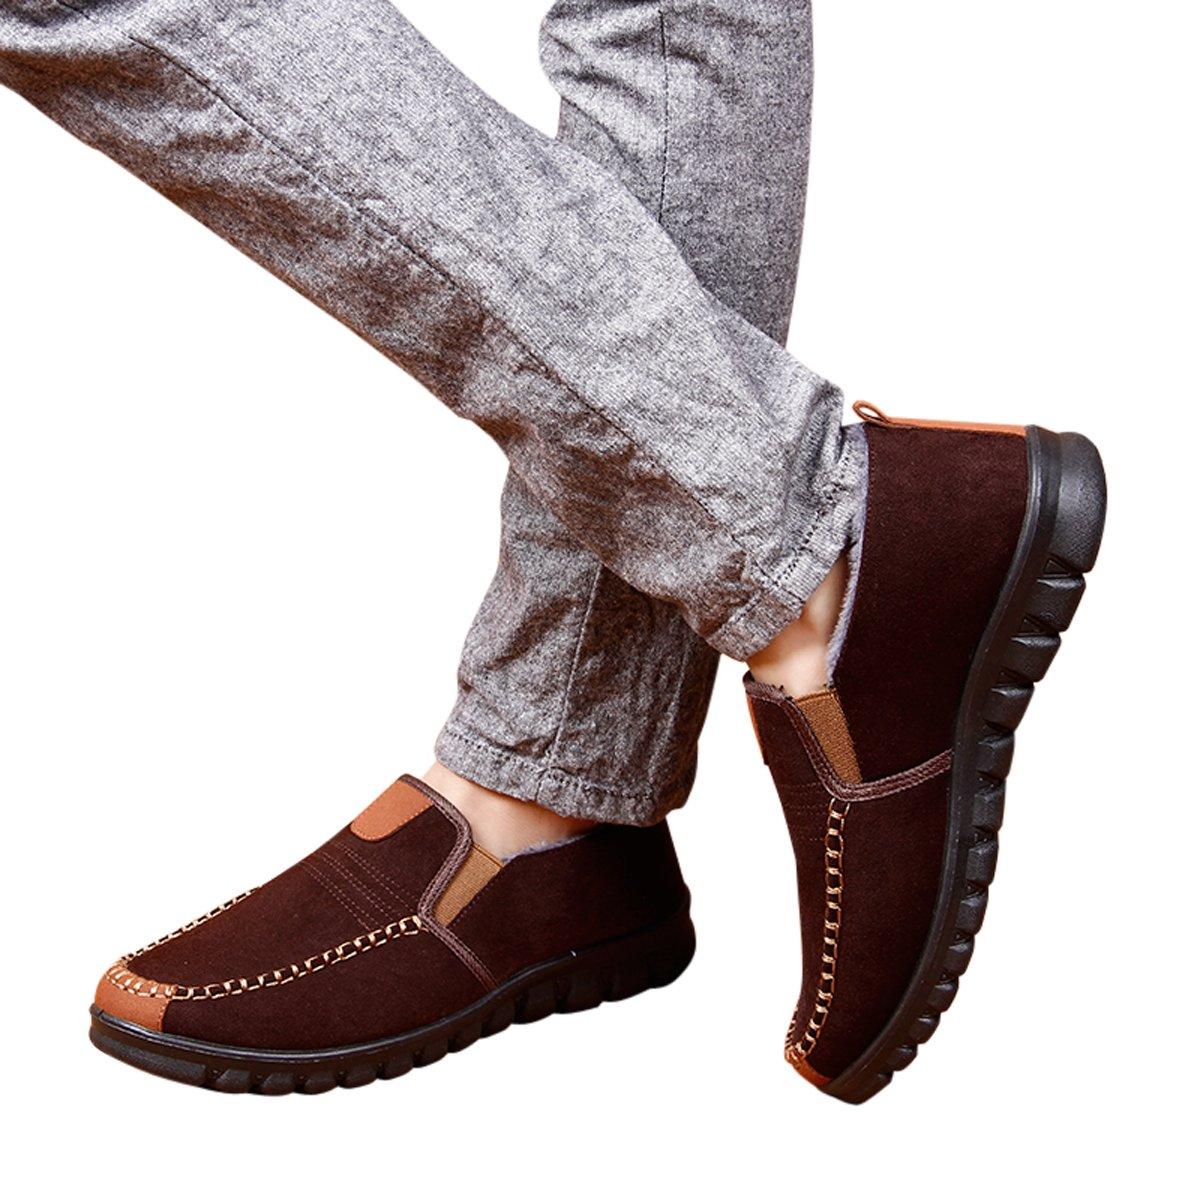 HAVINA House Slippers Comfy /& Warm Plush Fleece Lined Anti-Slip Winter Indoor Outdoor Shoes